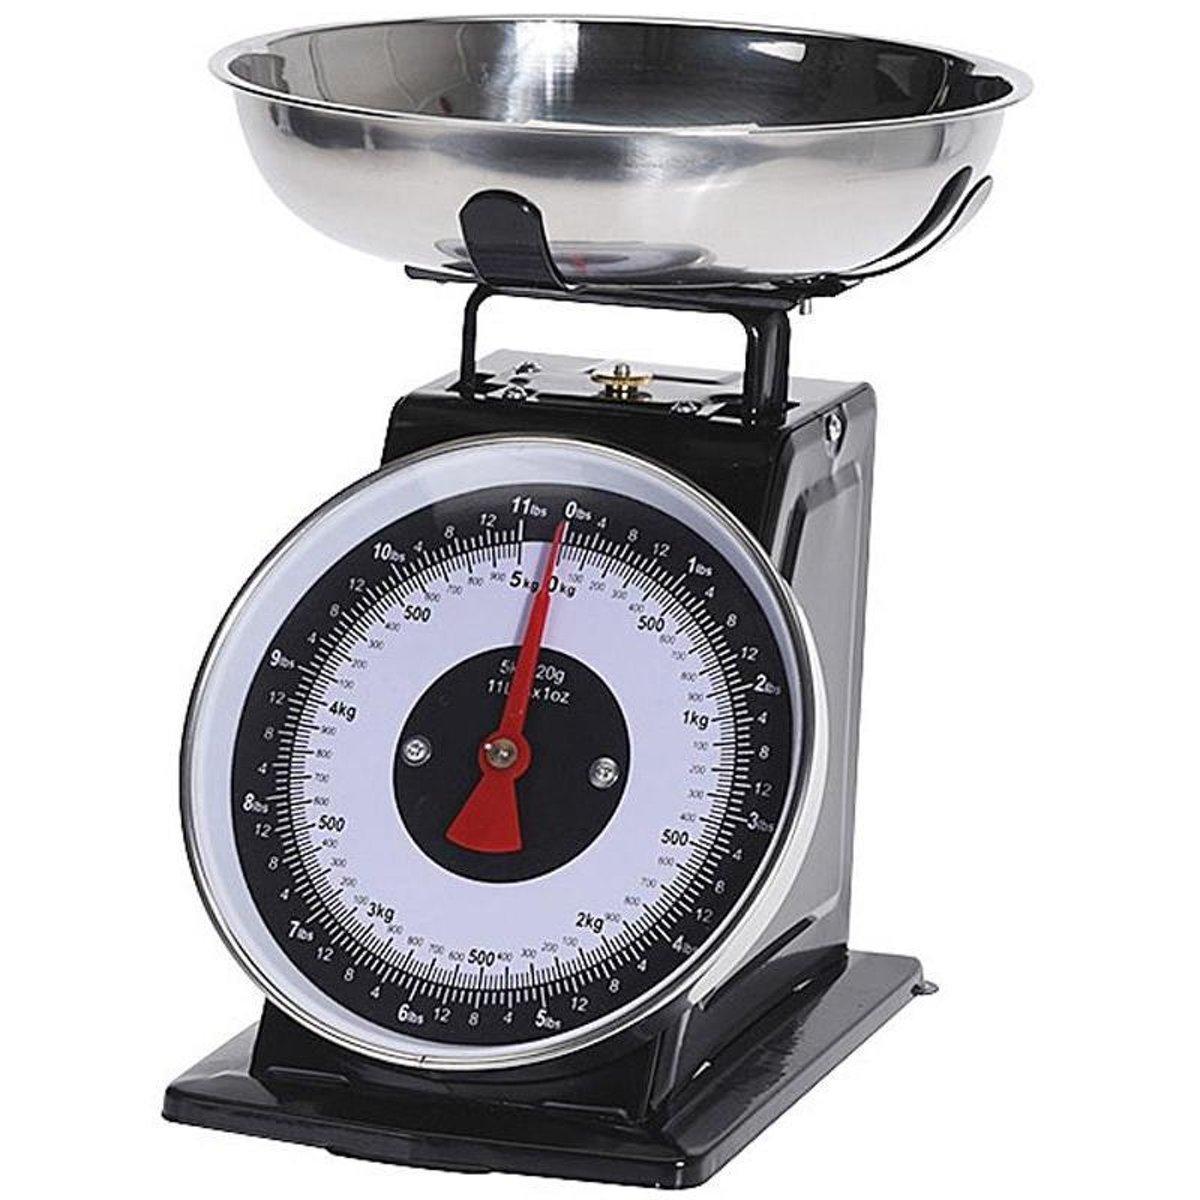 Excellent Houseware Keukenweegschaal 5kg, zwart